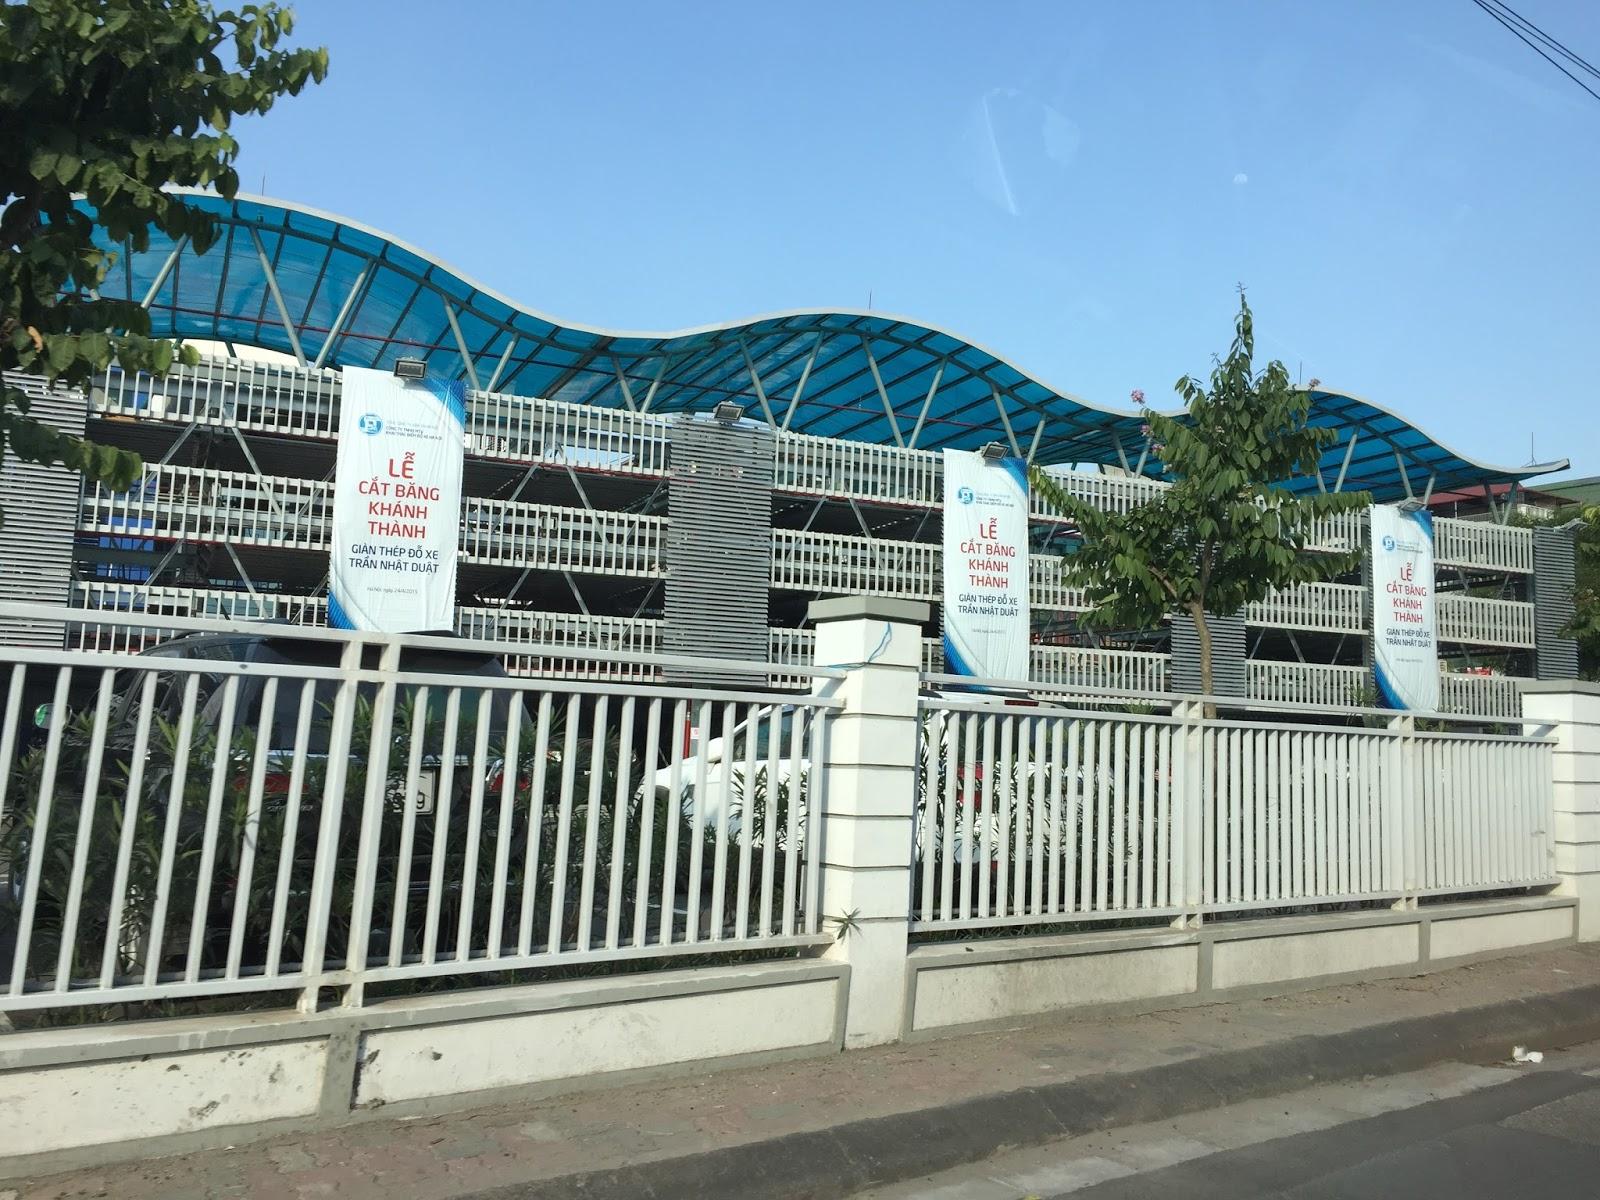 parking-structure-hanoi 立体駐車場